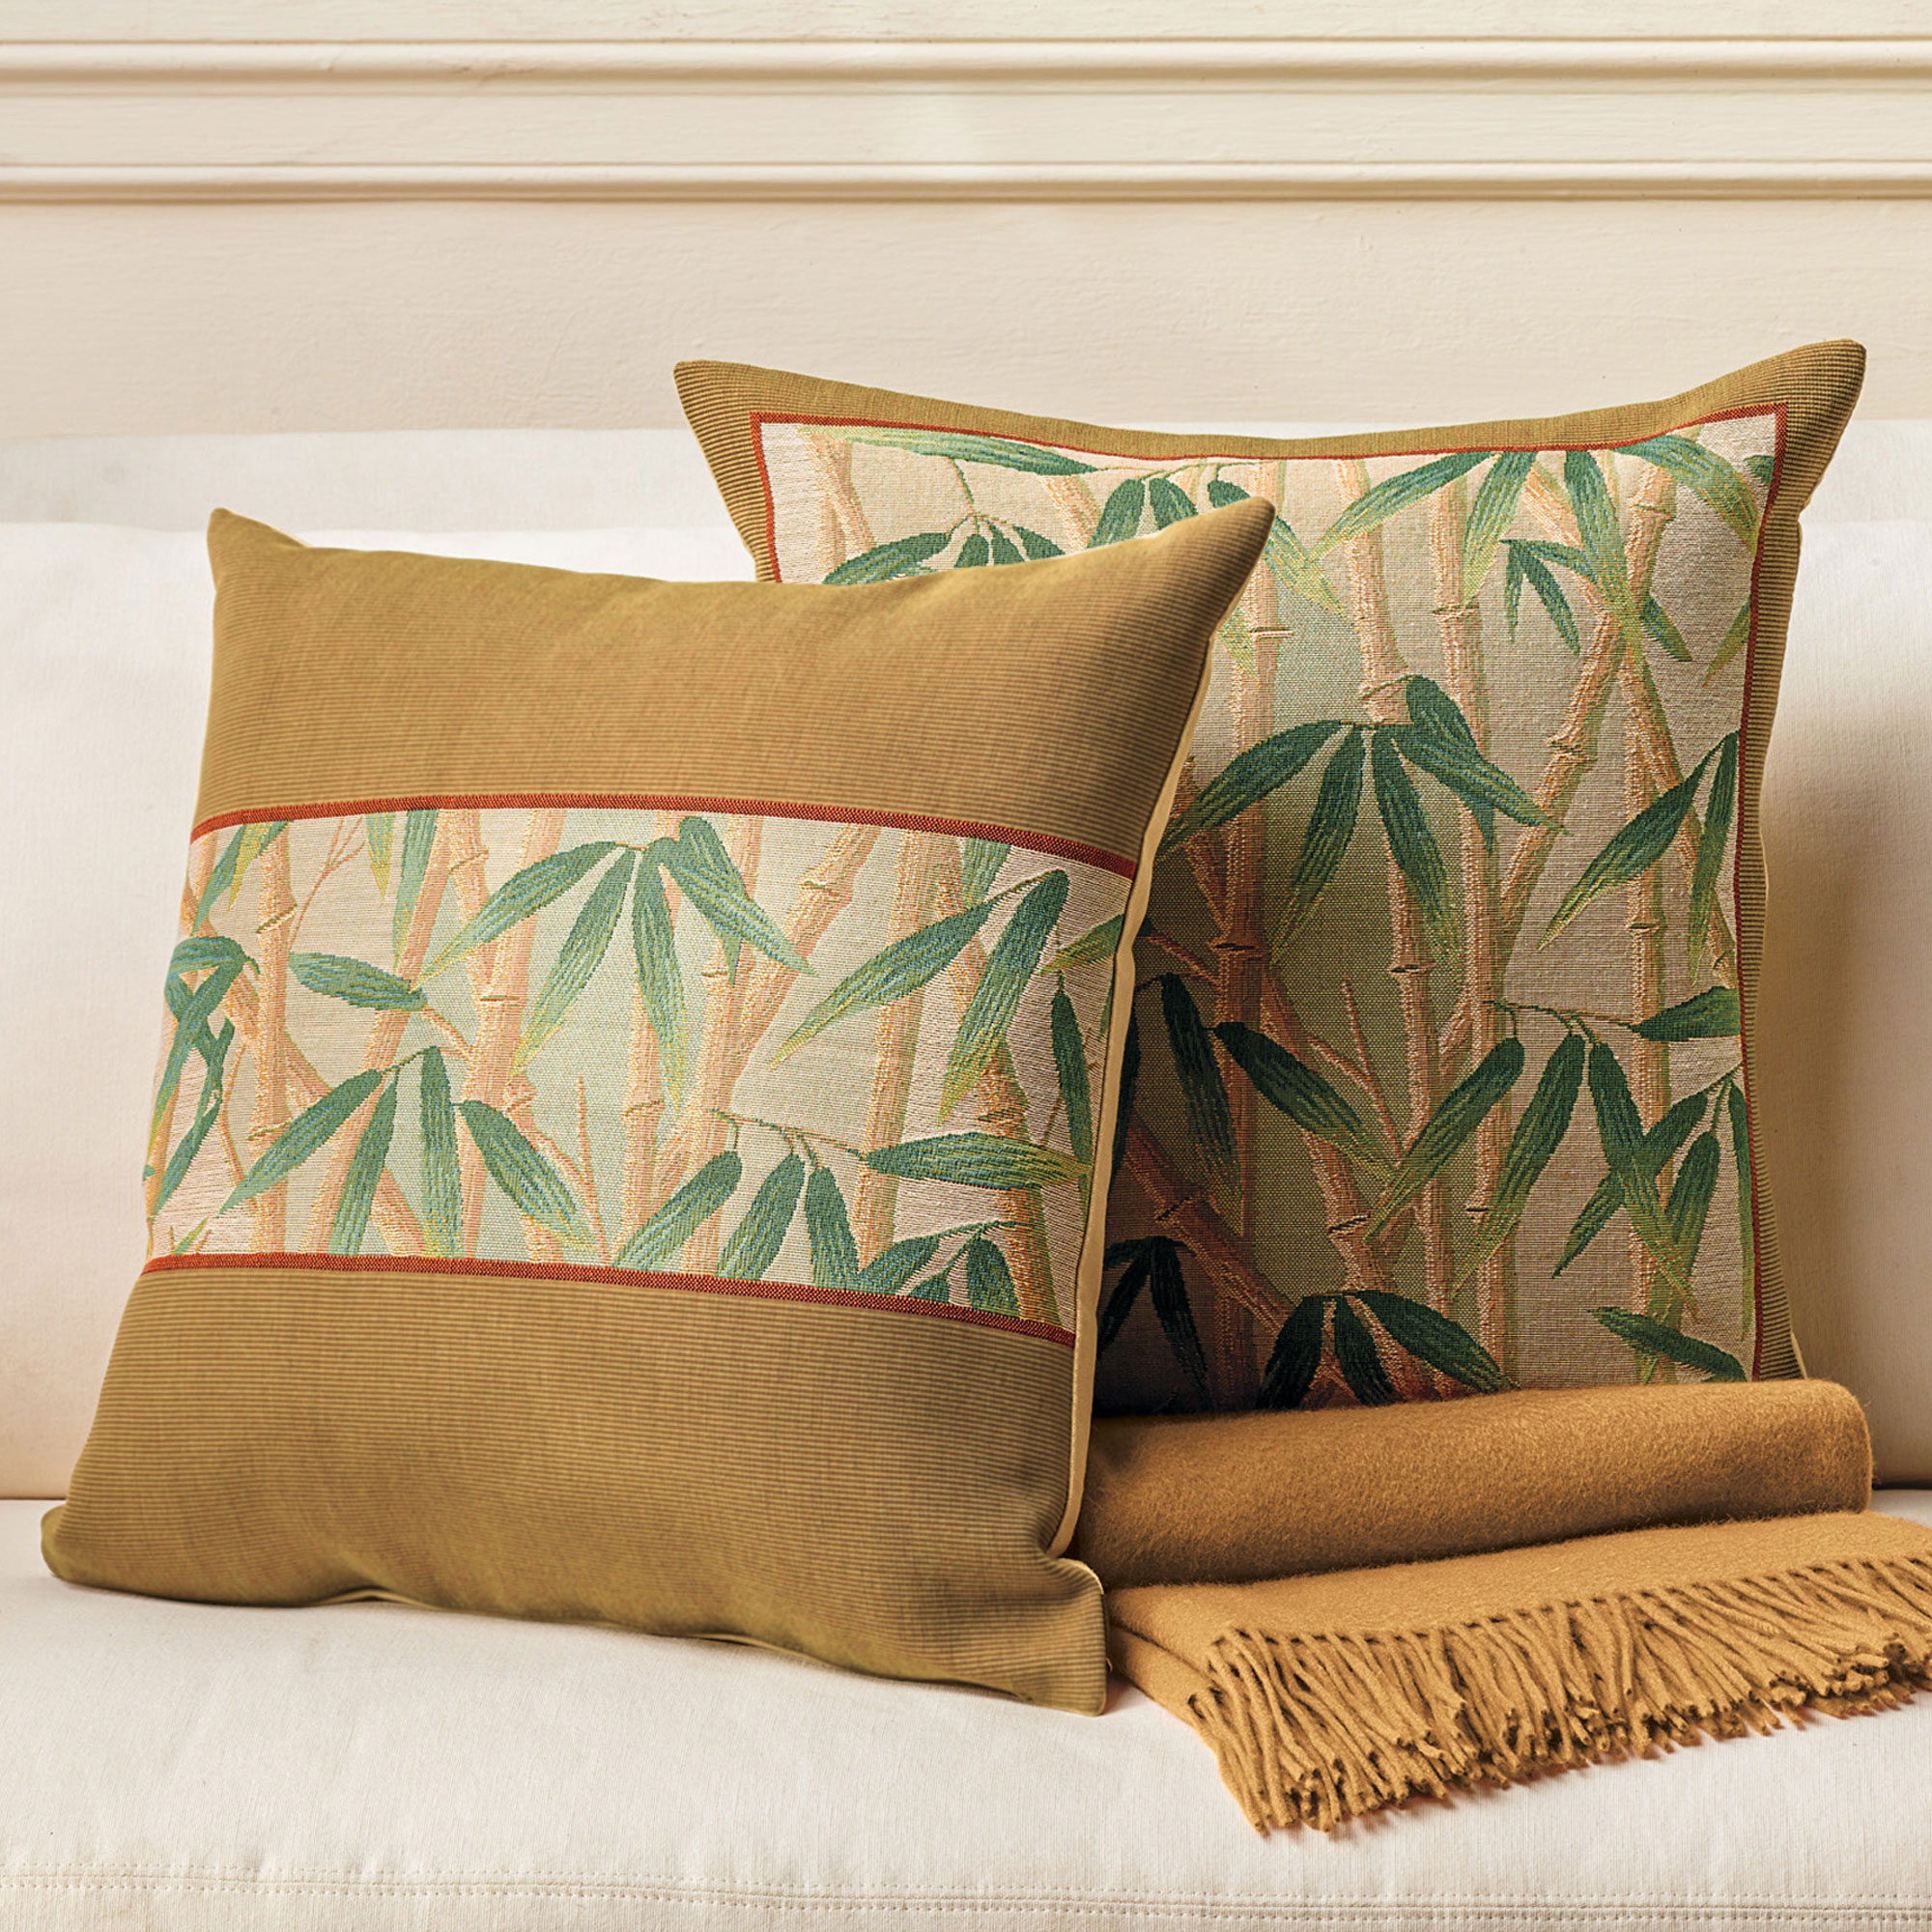 Throw Pillows Home : Bamboo Forest Pillows Gump s